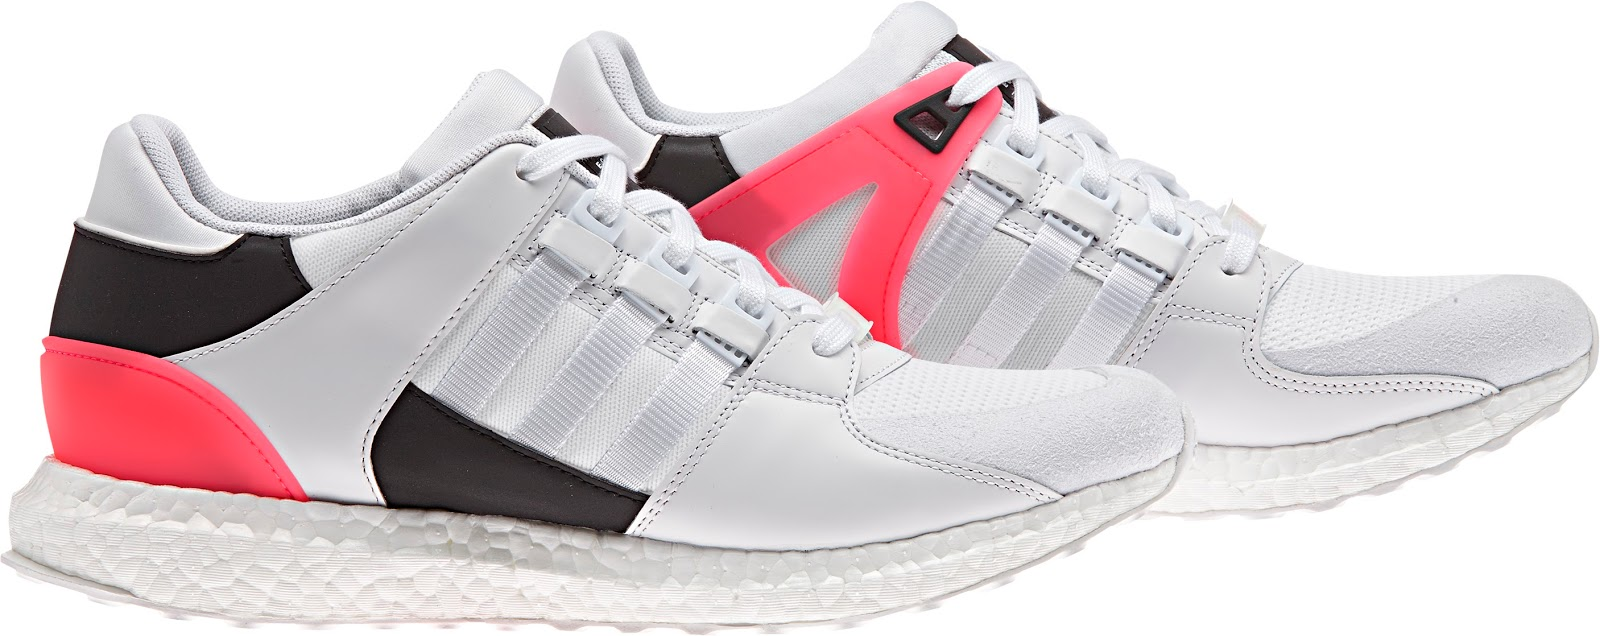 Kicks Off! The Sneaker Blog: adidas EQT Gaming Room PopUp